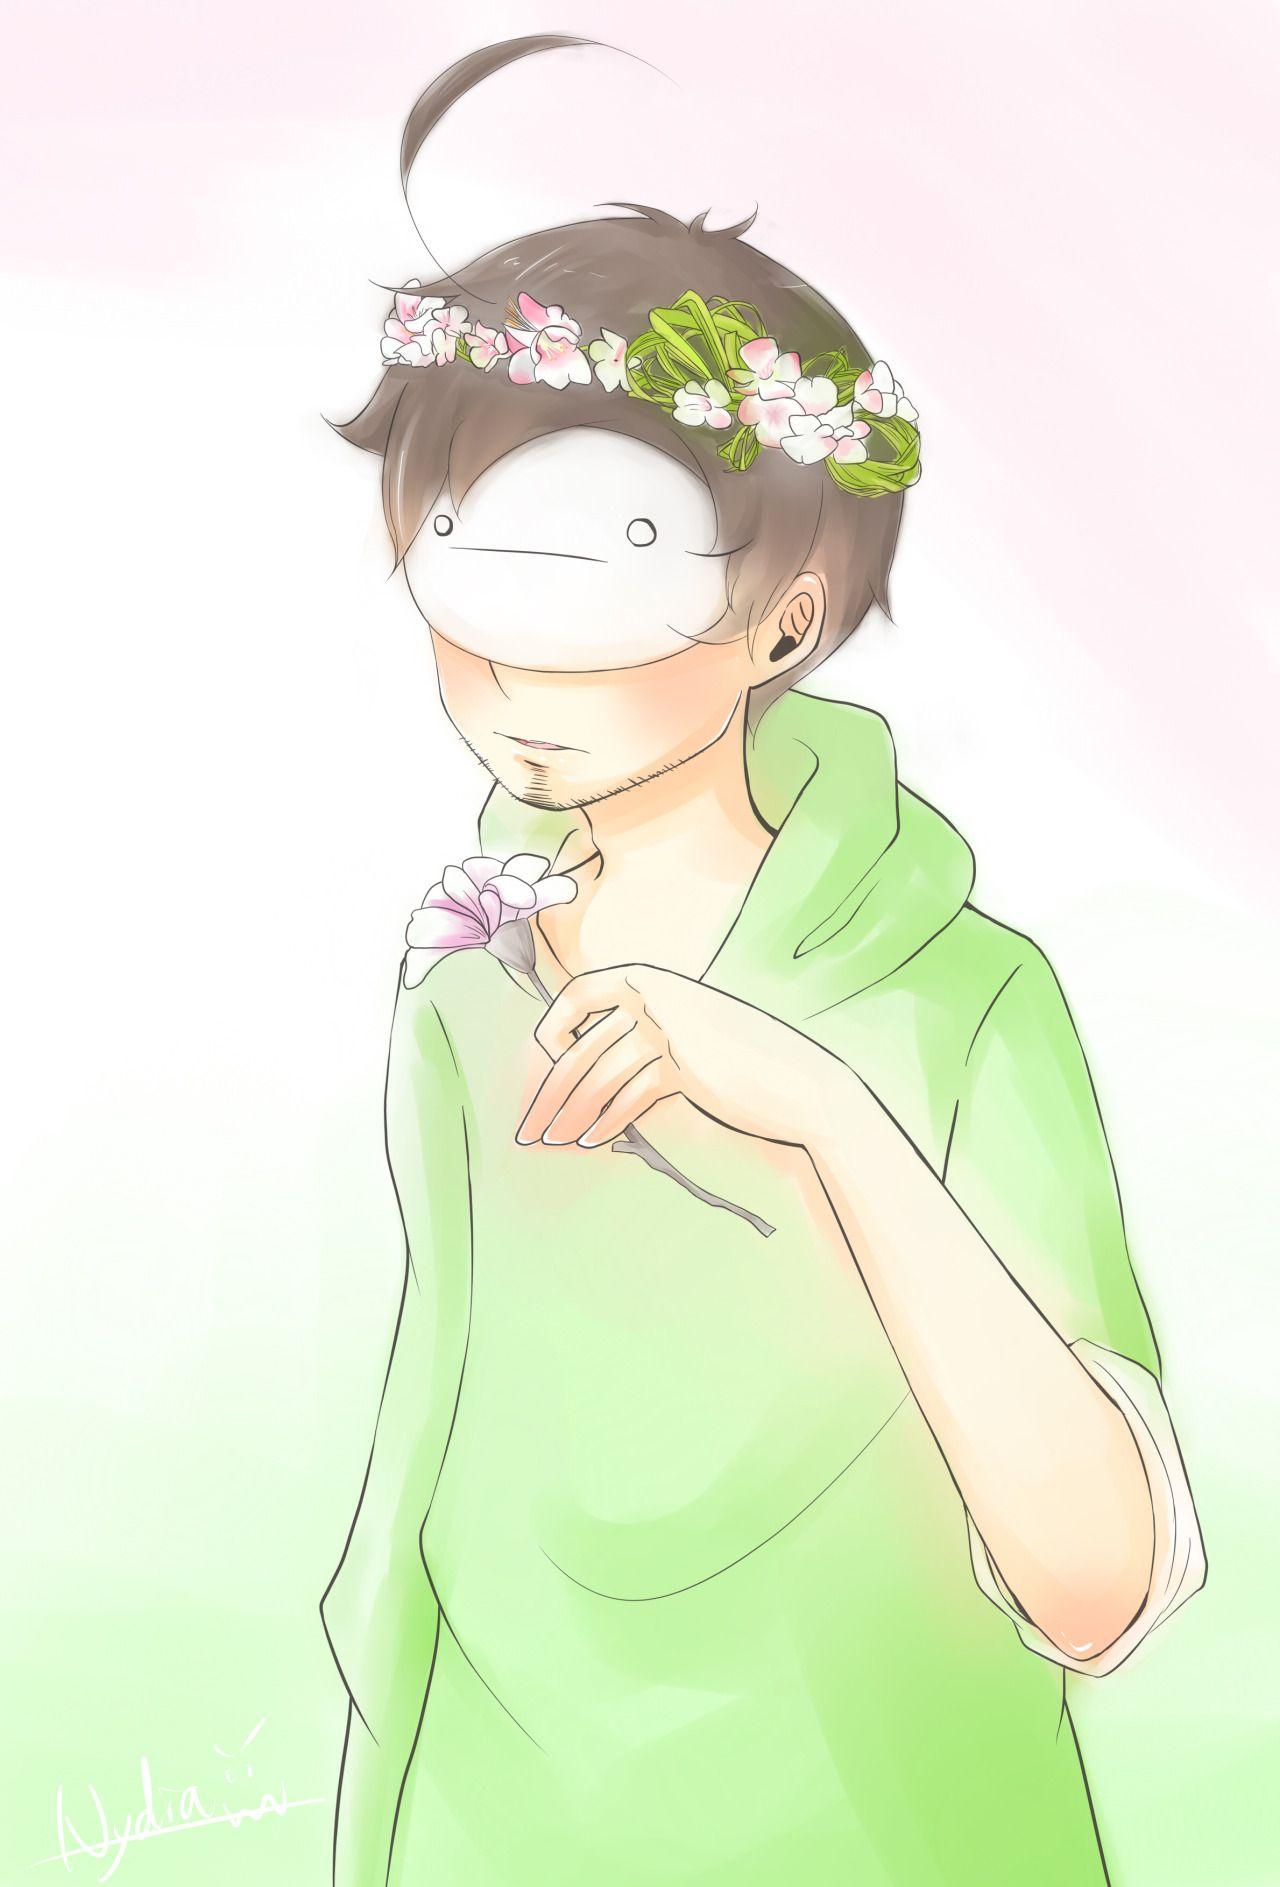 Httpnydia stripedbubbletumblrpost121106210713okay here it httpnydia stripedbubbletumblrpost121106210713okay here it is flower crown cry by izmirmasajfo